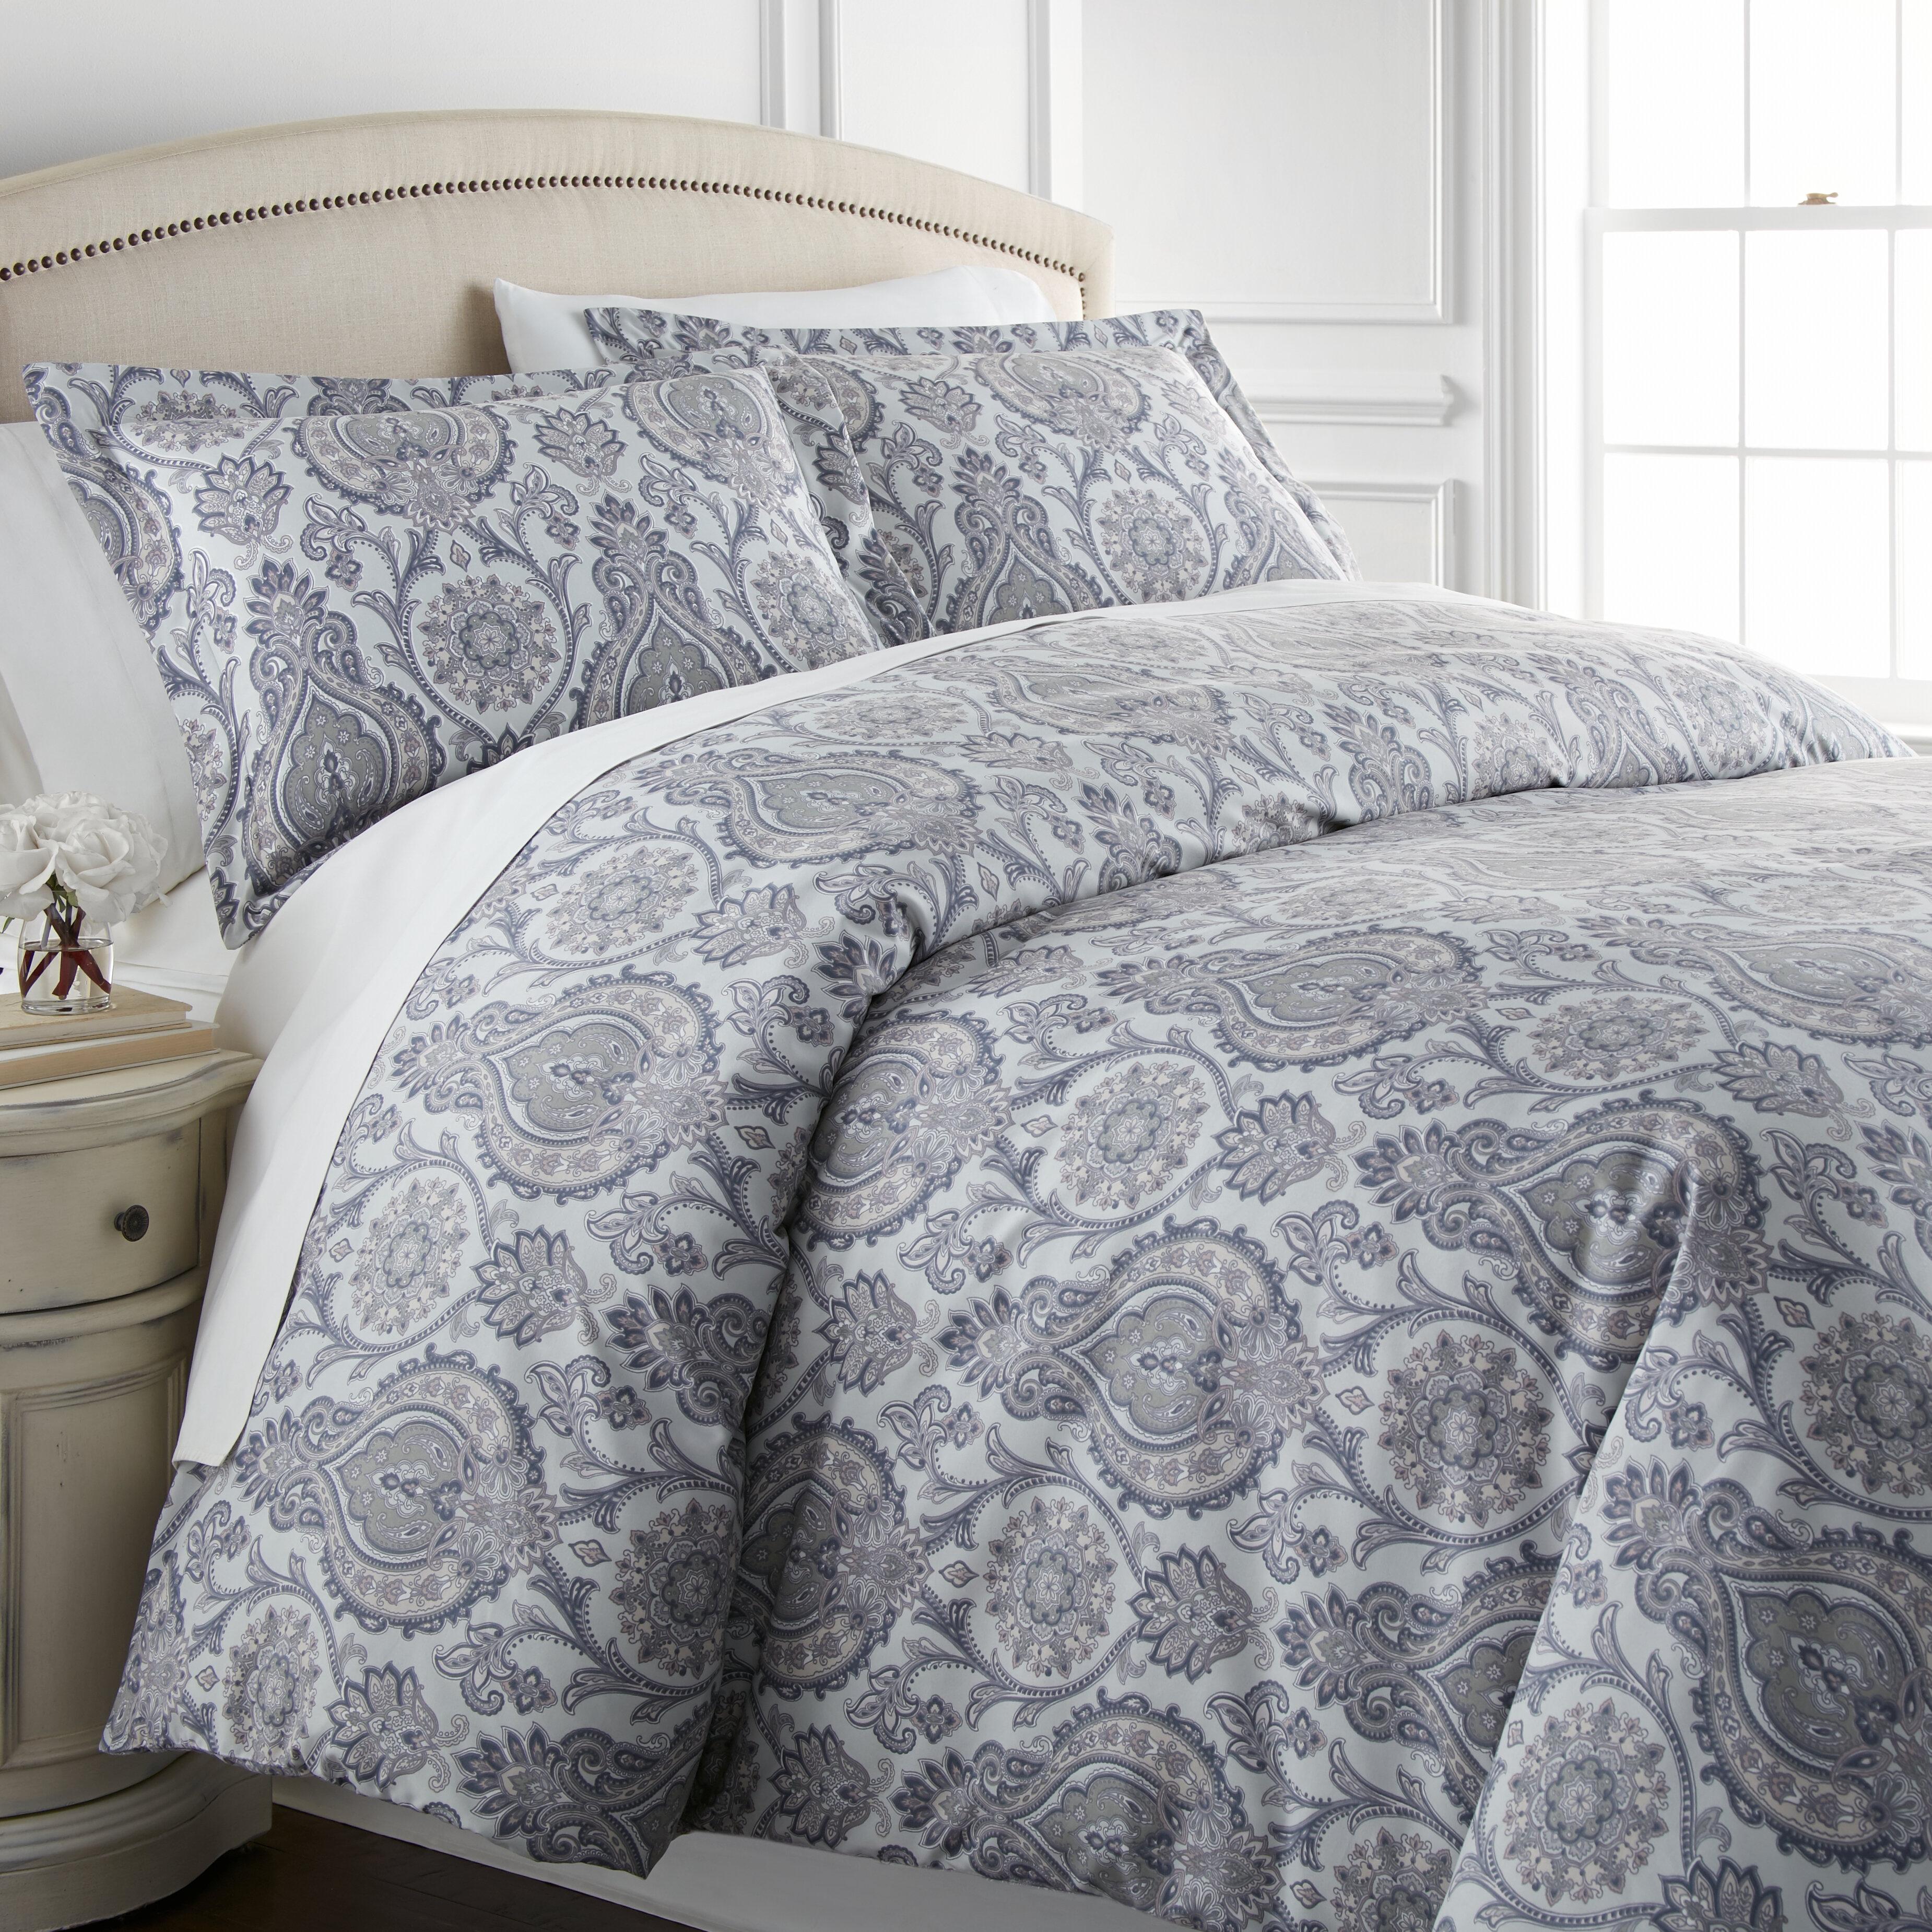 Kynlee Paisley Down Alternate Comforter Set